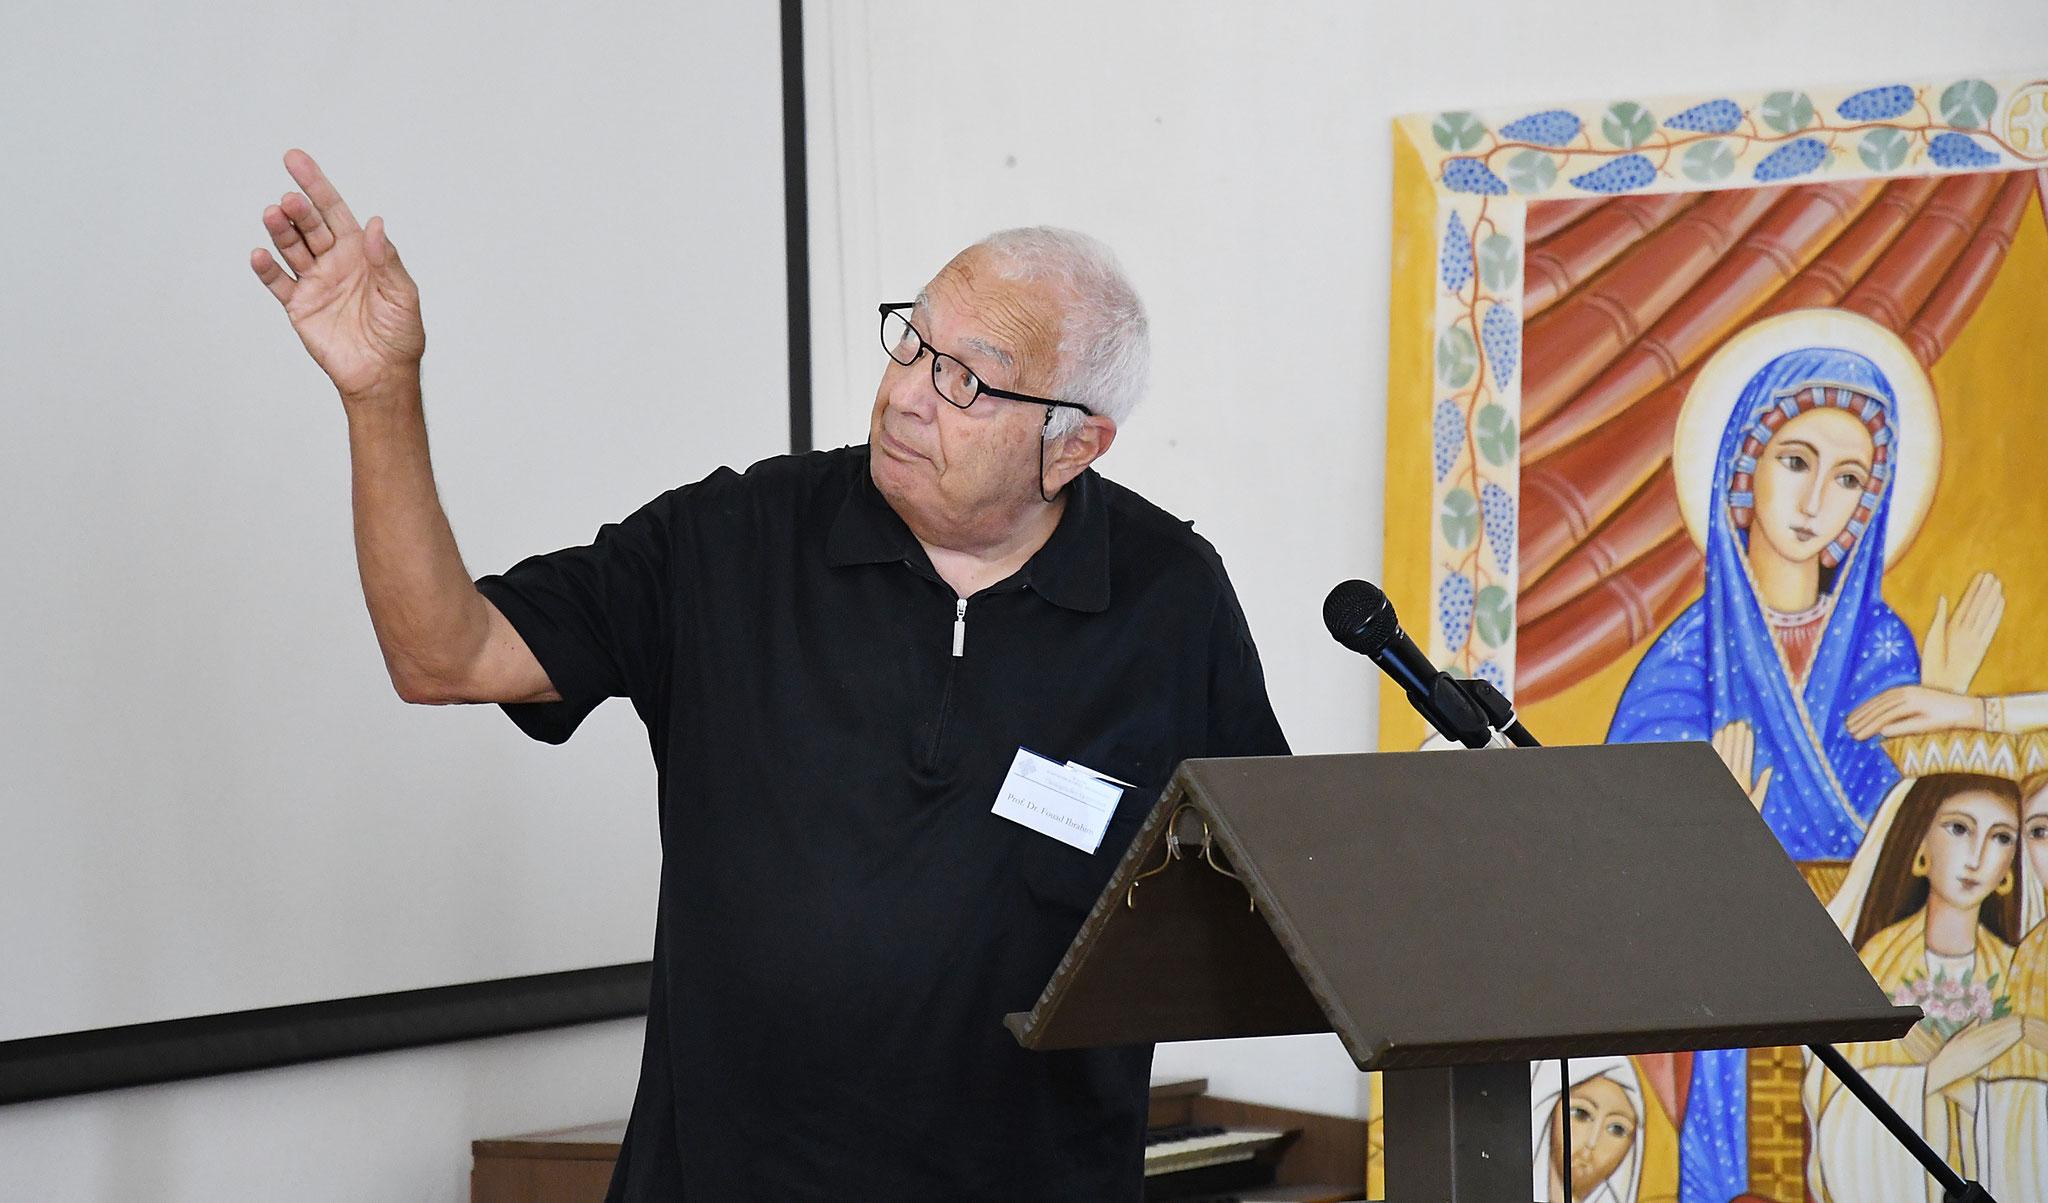 Vortrag von Prof. Dr. Fouad Ibrahim. Foto: Maria Hopp